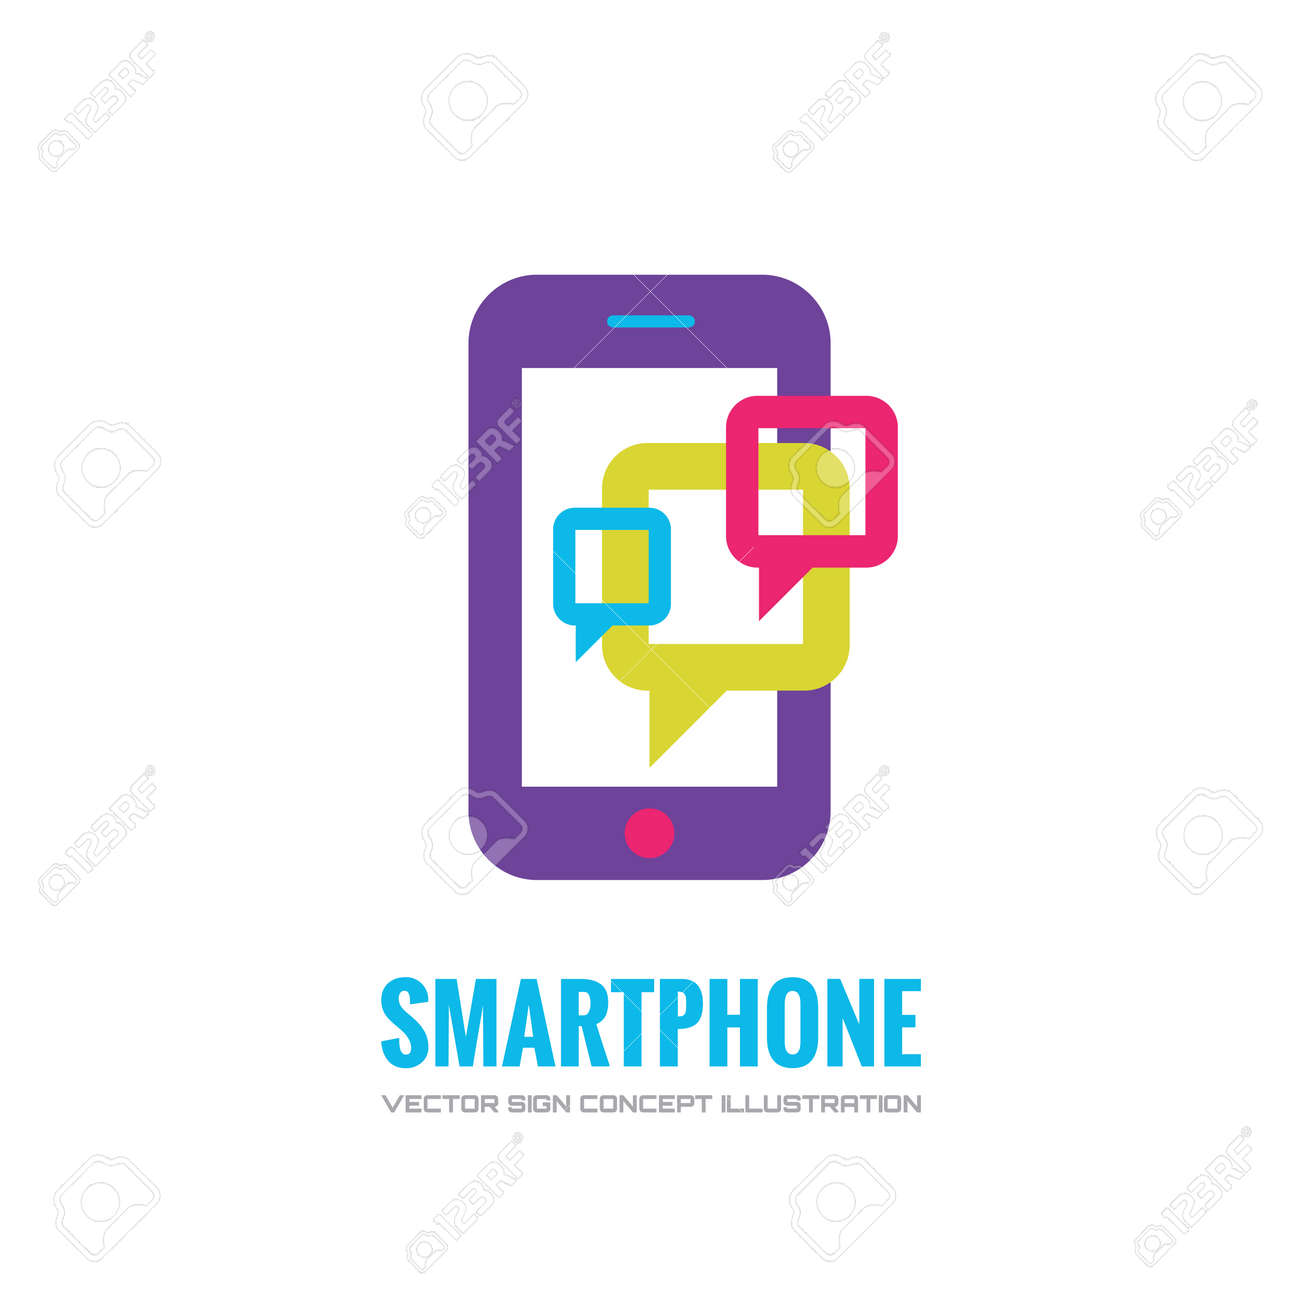 Smatphone vector logo concept illustration. Mobile phone vector logo creative illustration. Mobile technology logo. Cellpnone logo. Mobile phone logo design. Vector logo template. Design element. - 52809437